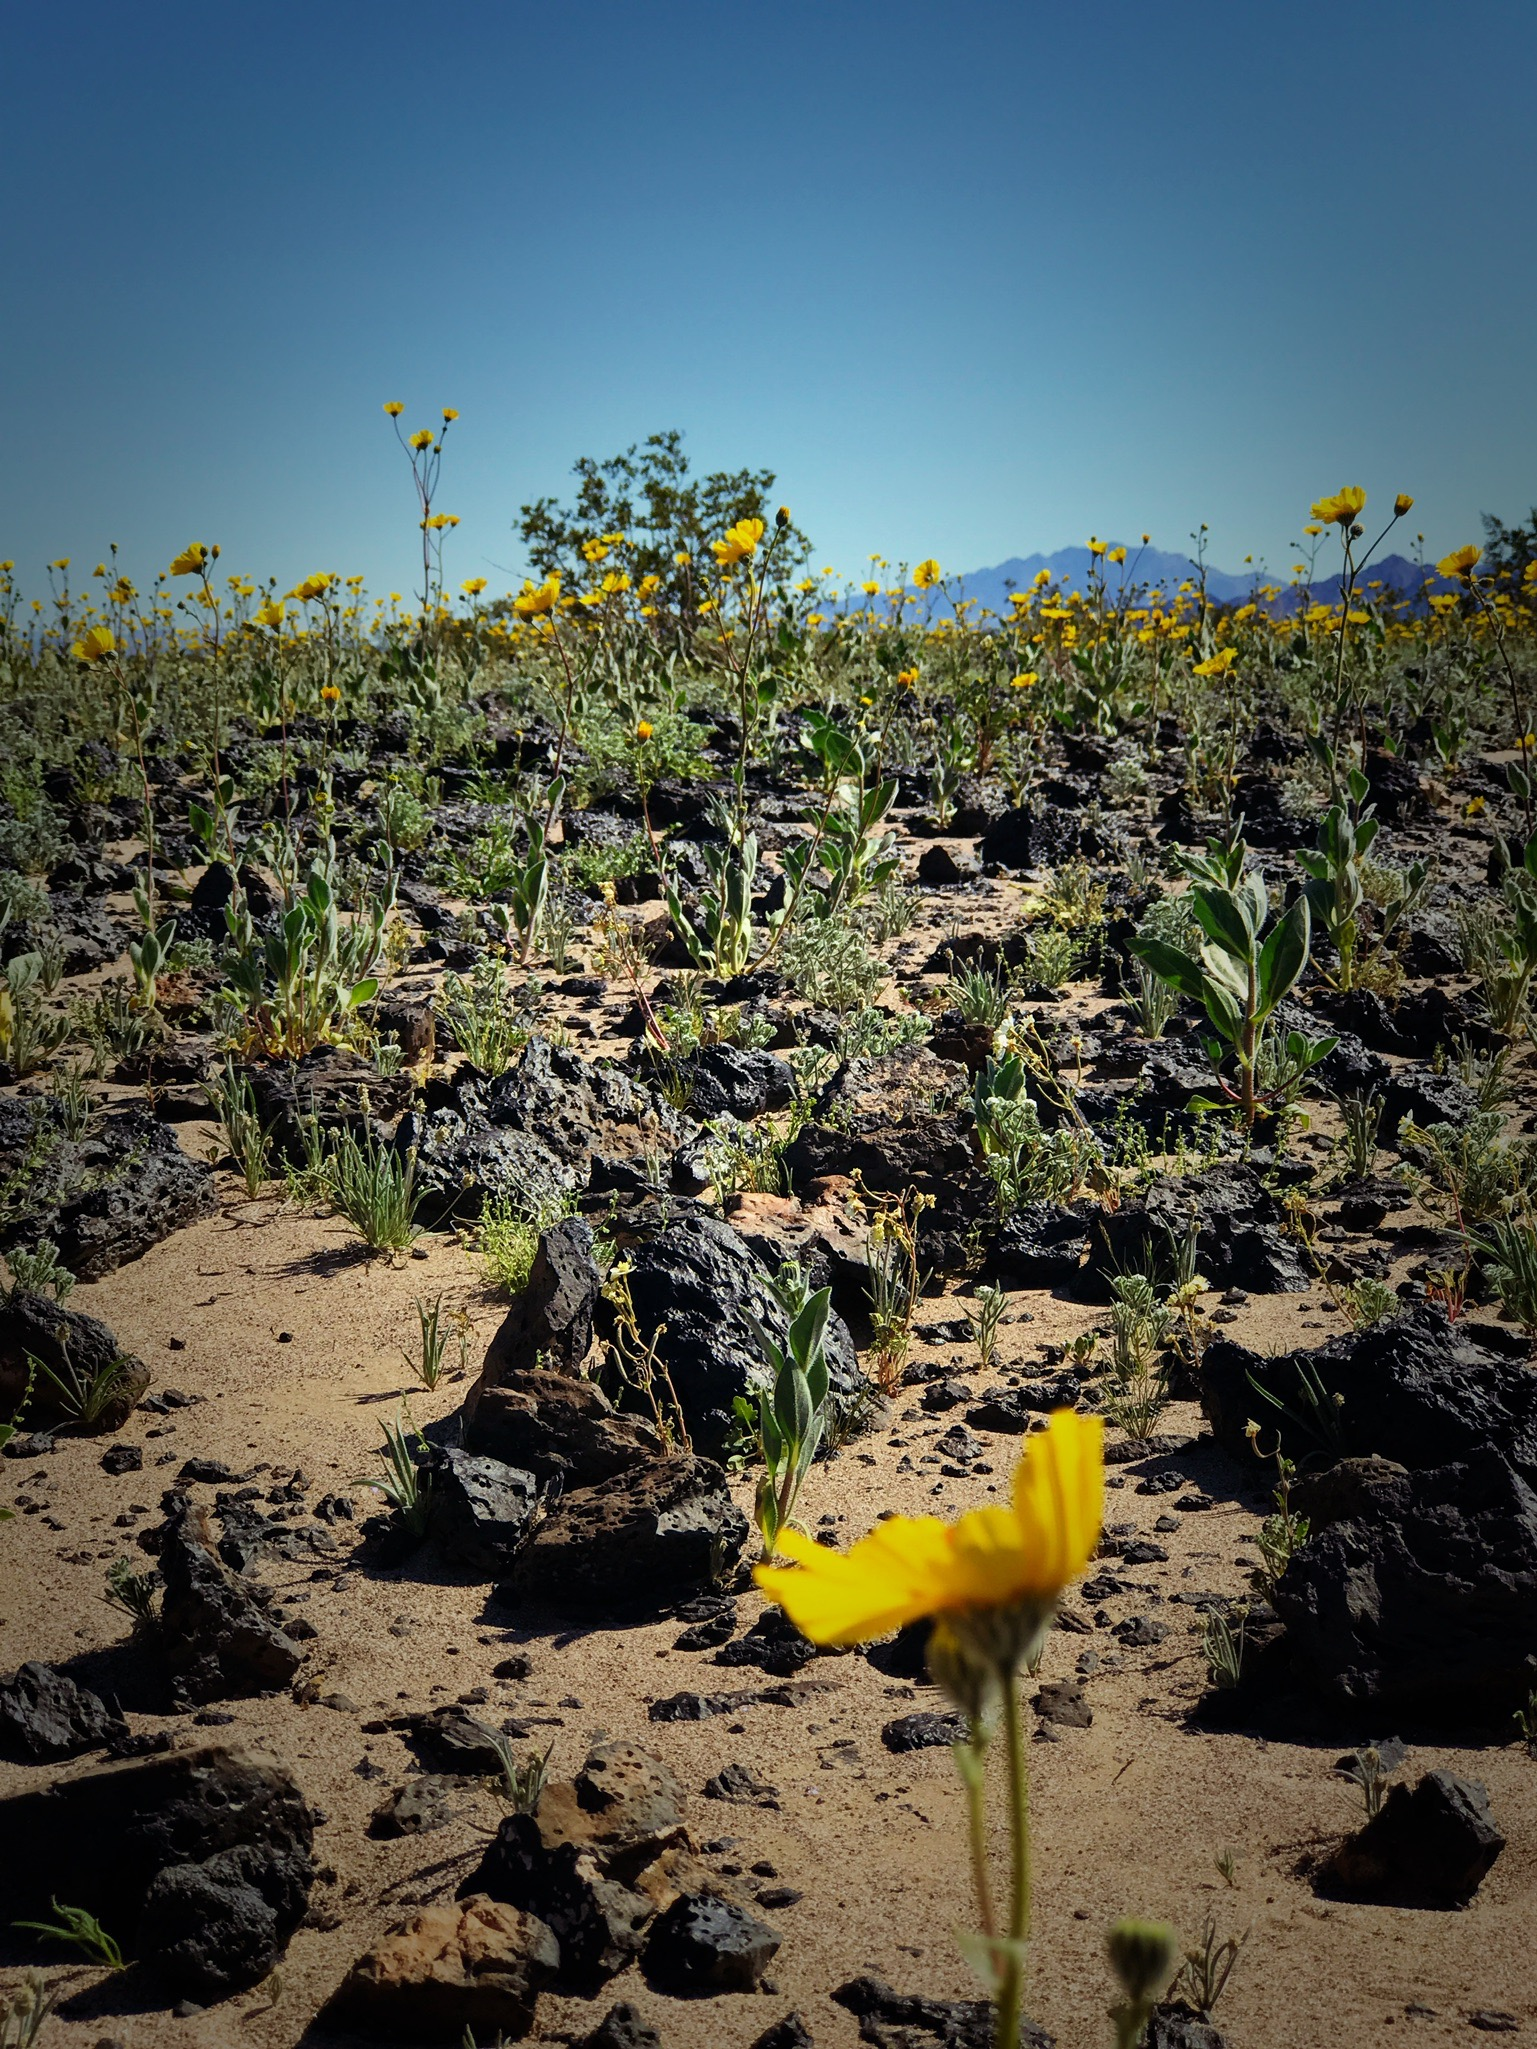 Mojave Desert, March 2017